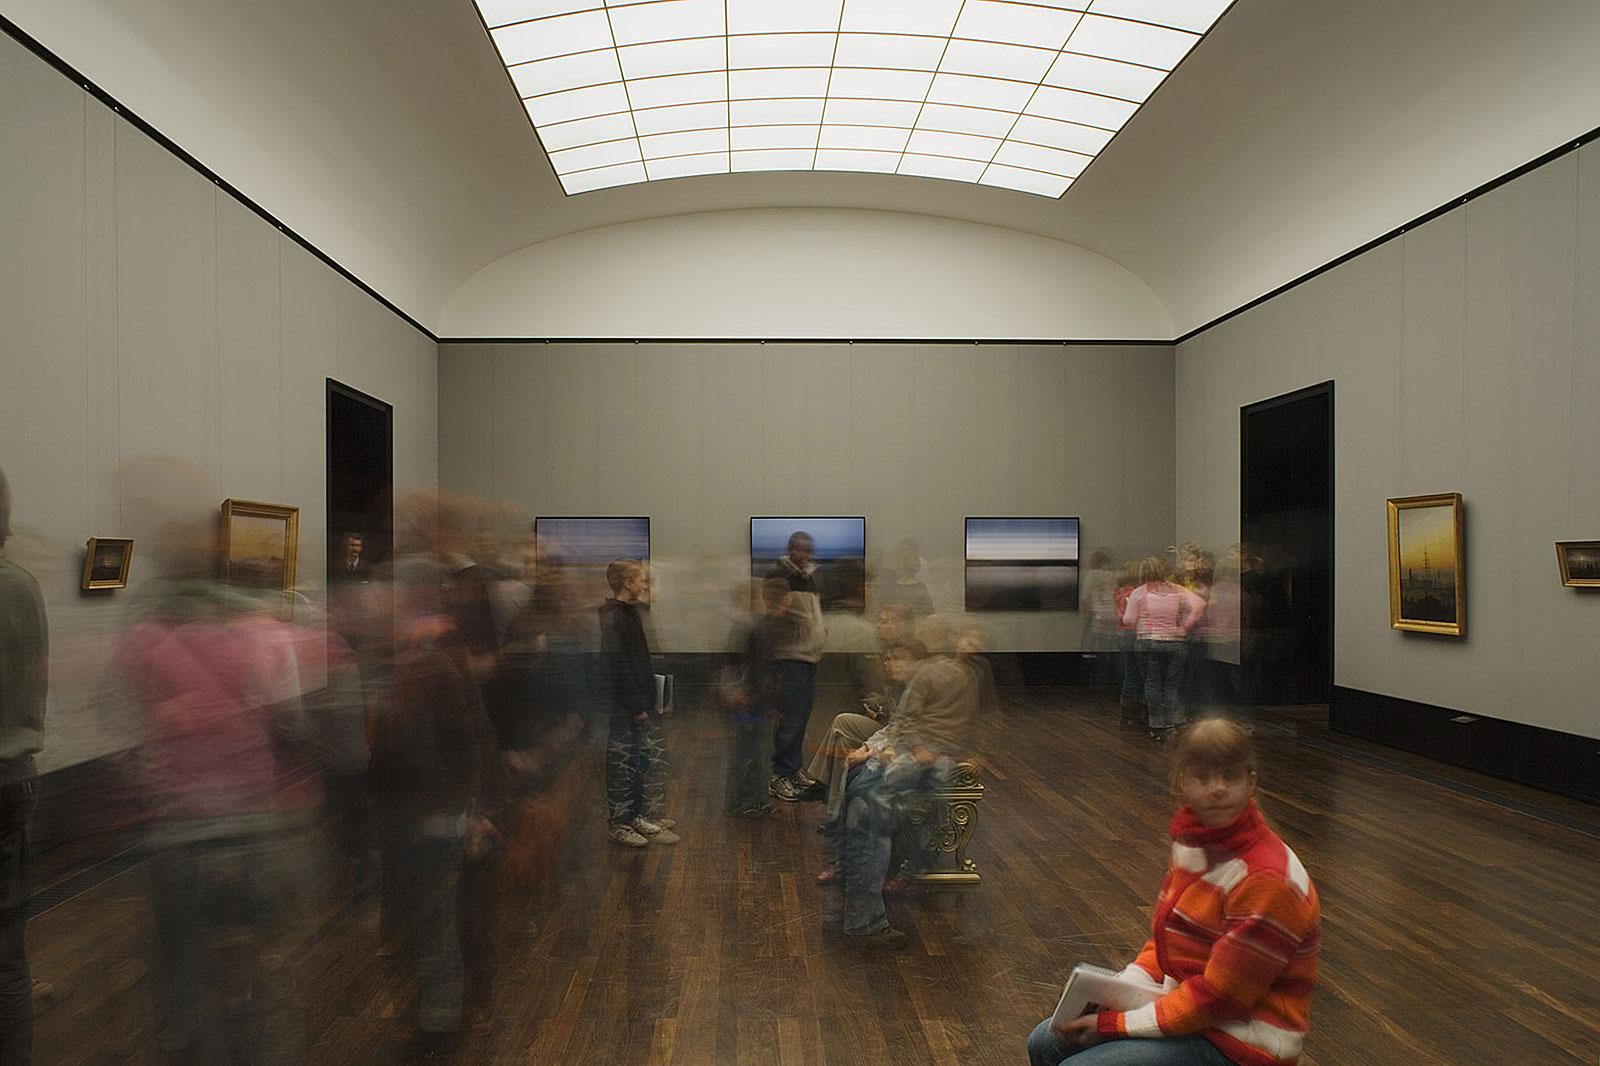 Alte Nationalgalerie Berlin (11.43 - 11.46 Uhr, 22.3.2006)